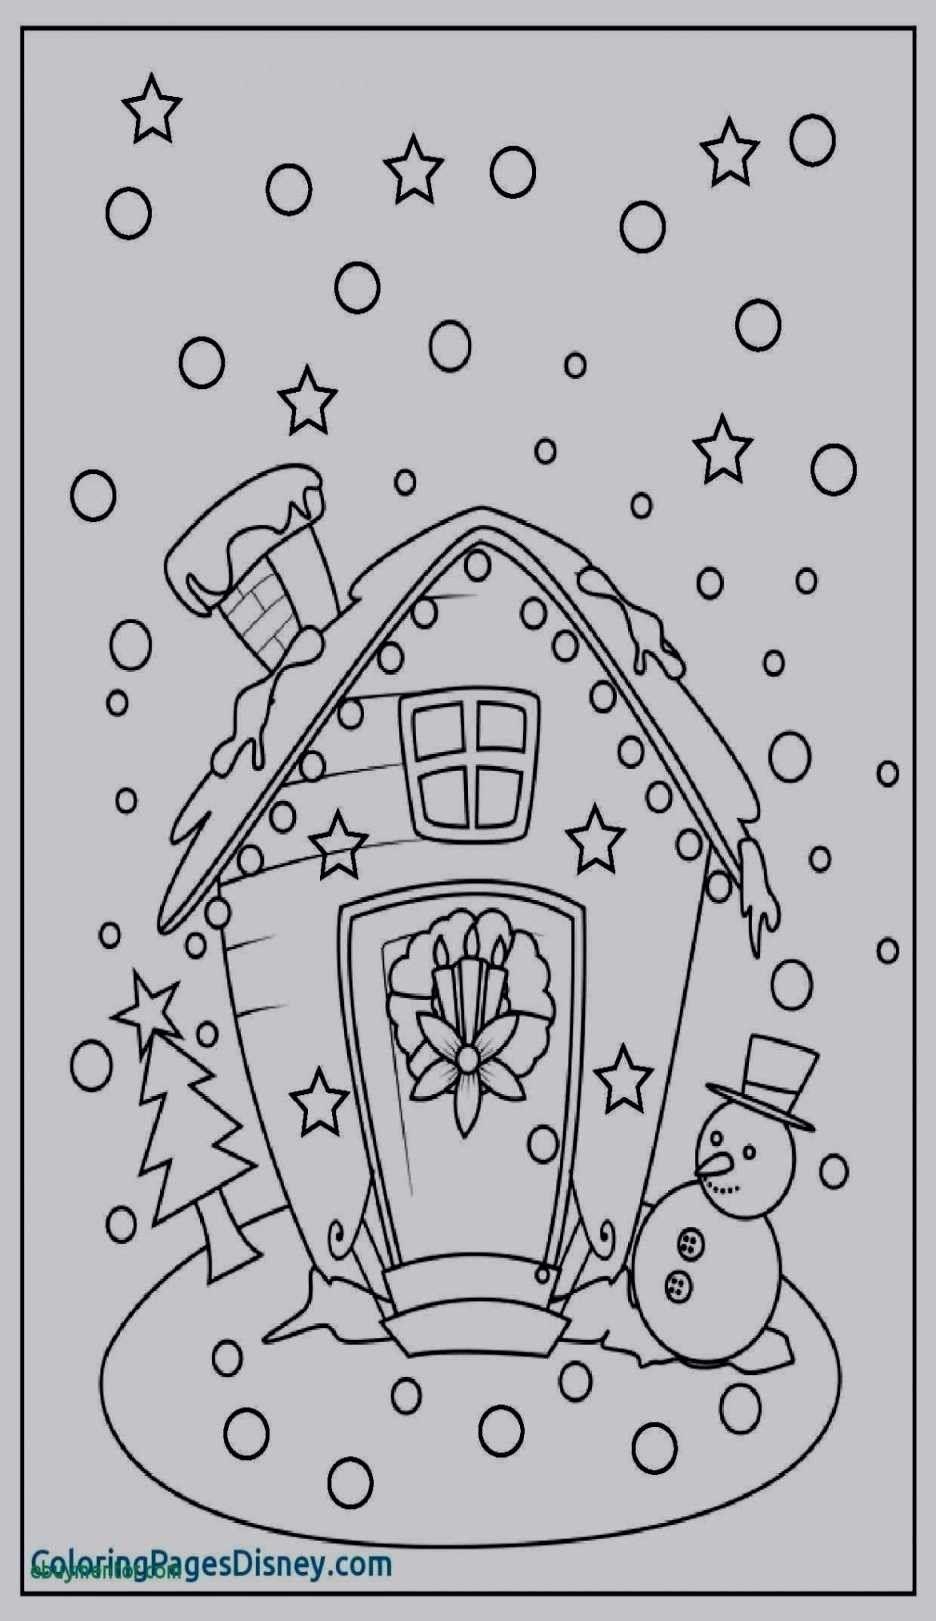 Disney Coloring Book Pdf Elegant Disney Winter Coloring Pages Kanta Printable Christmas Coloring Pages Free Christmas Coloring Pages Christmas Coloring Sheets